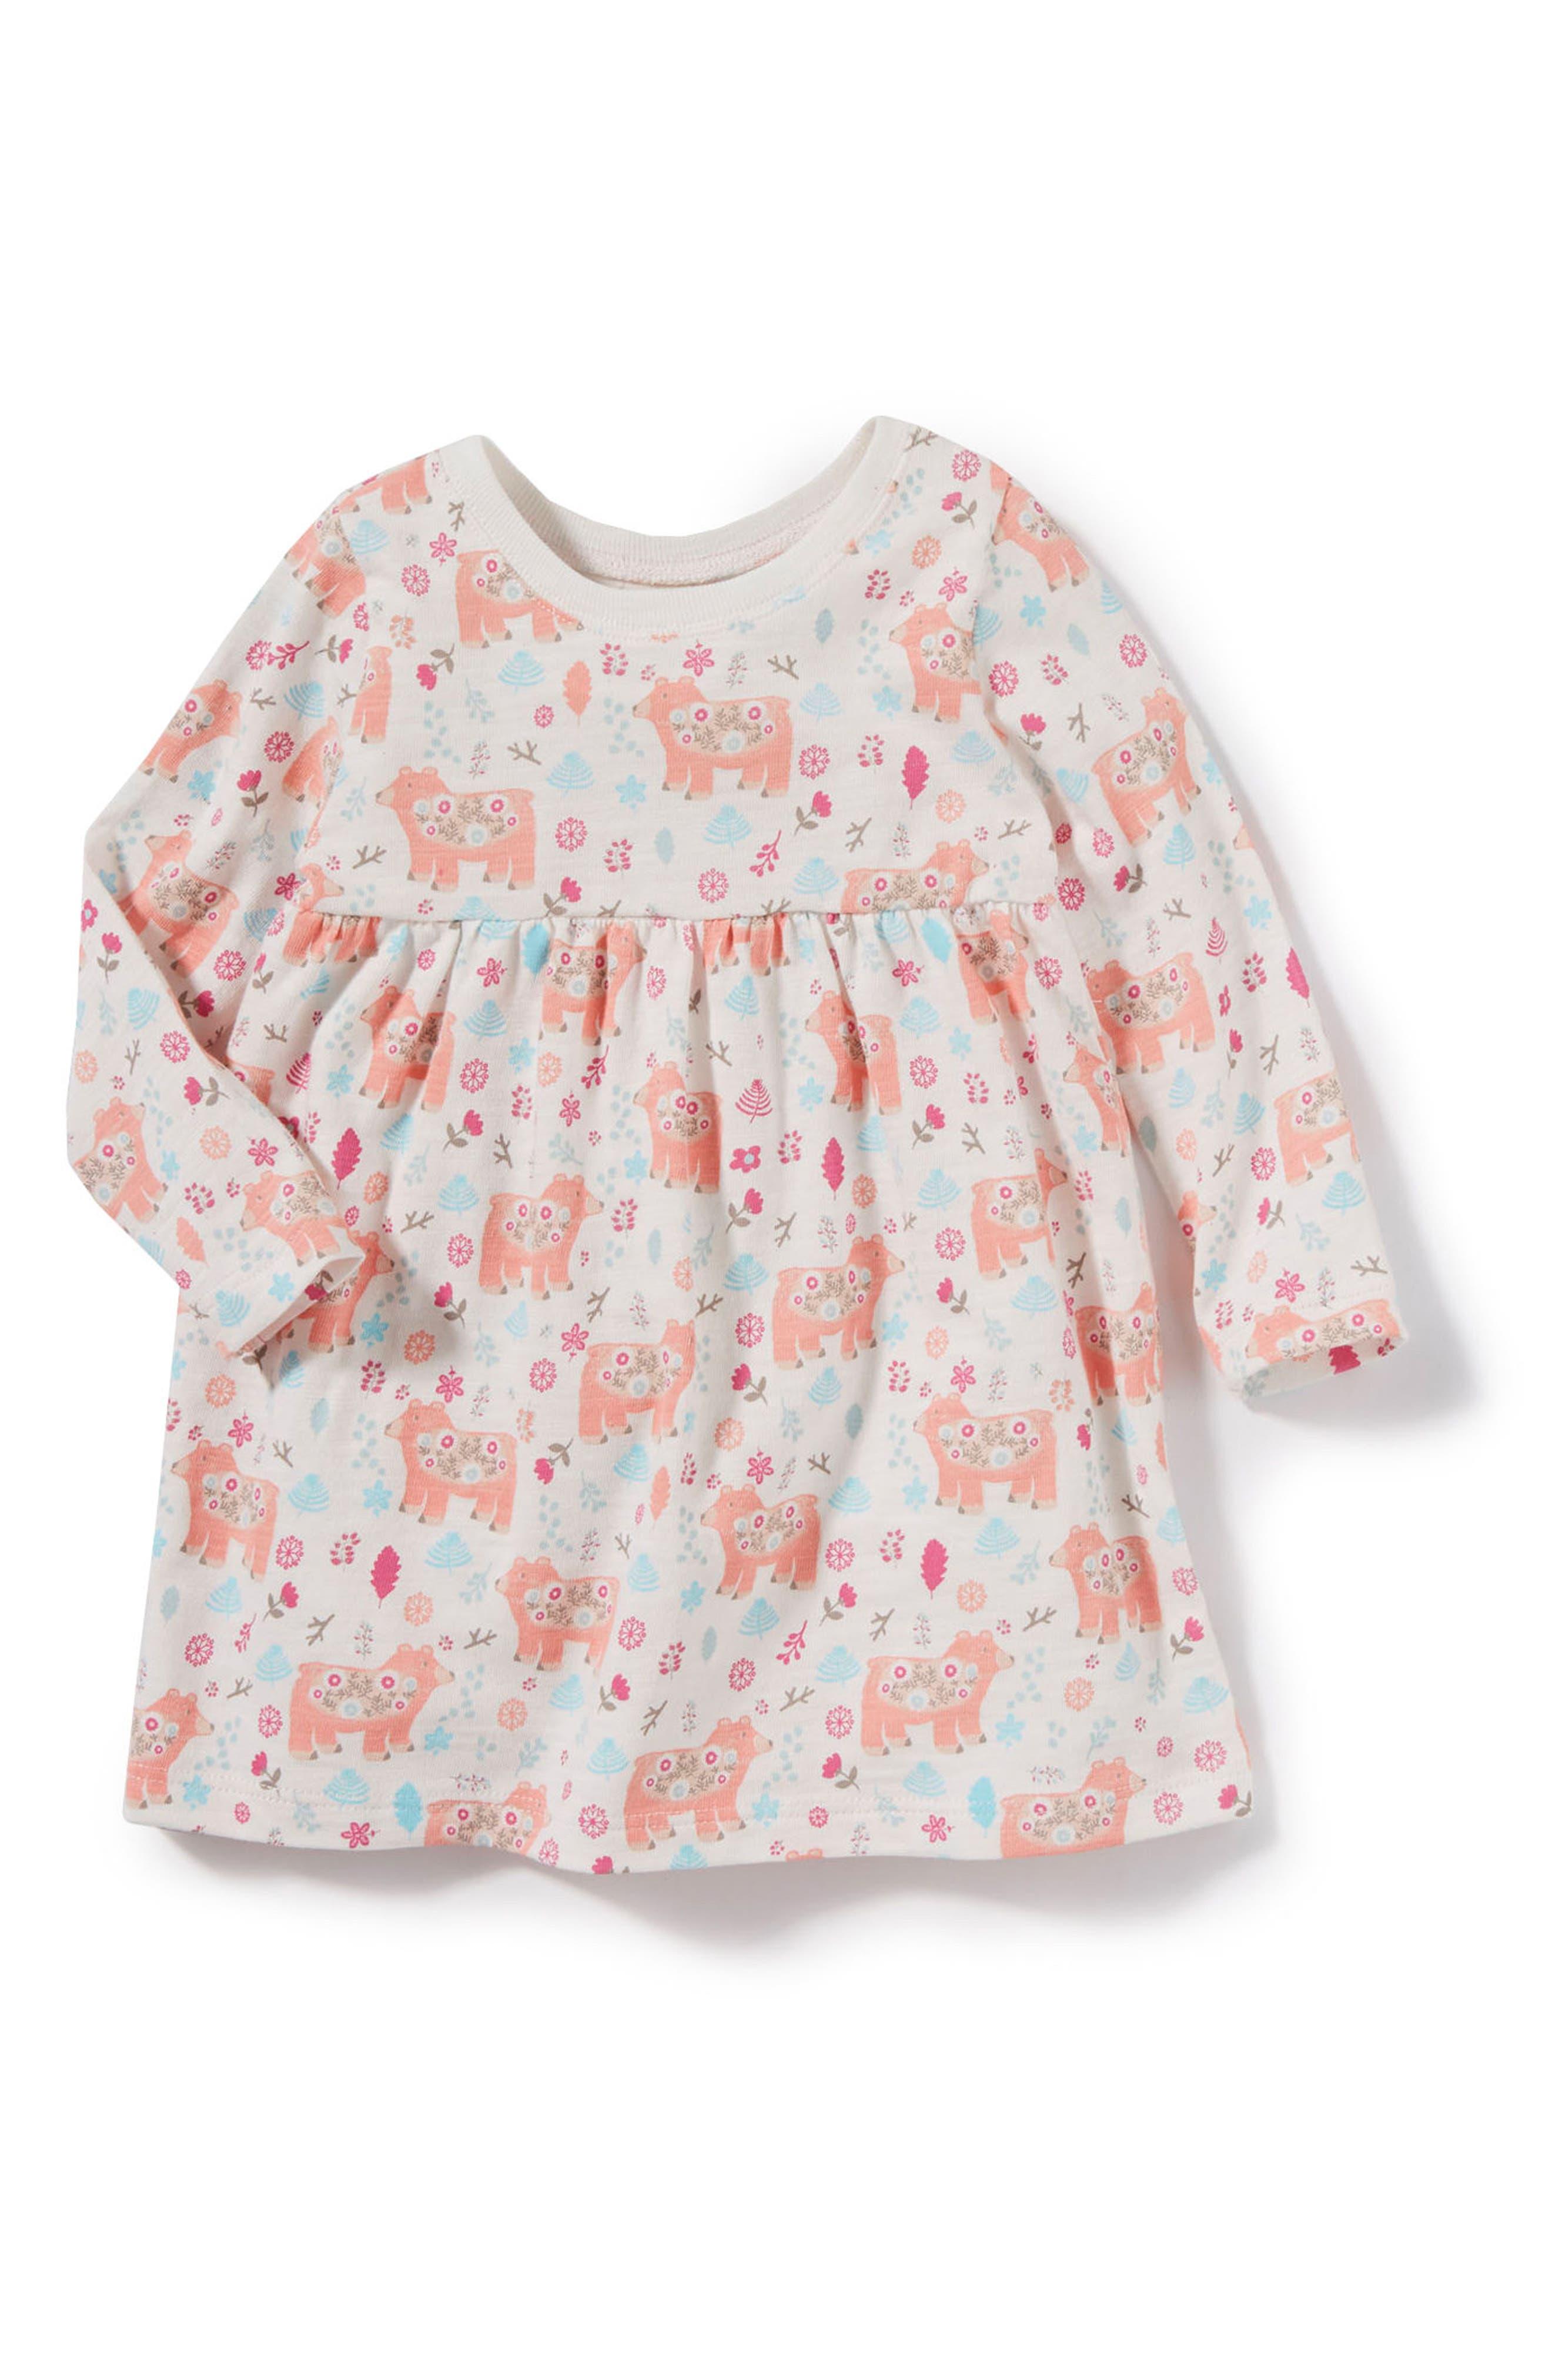 Alternate Image 1 Selected - Peek Sloan Dress (Baby Girls)